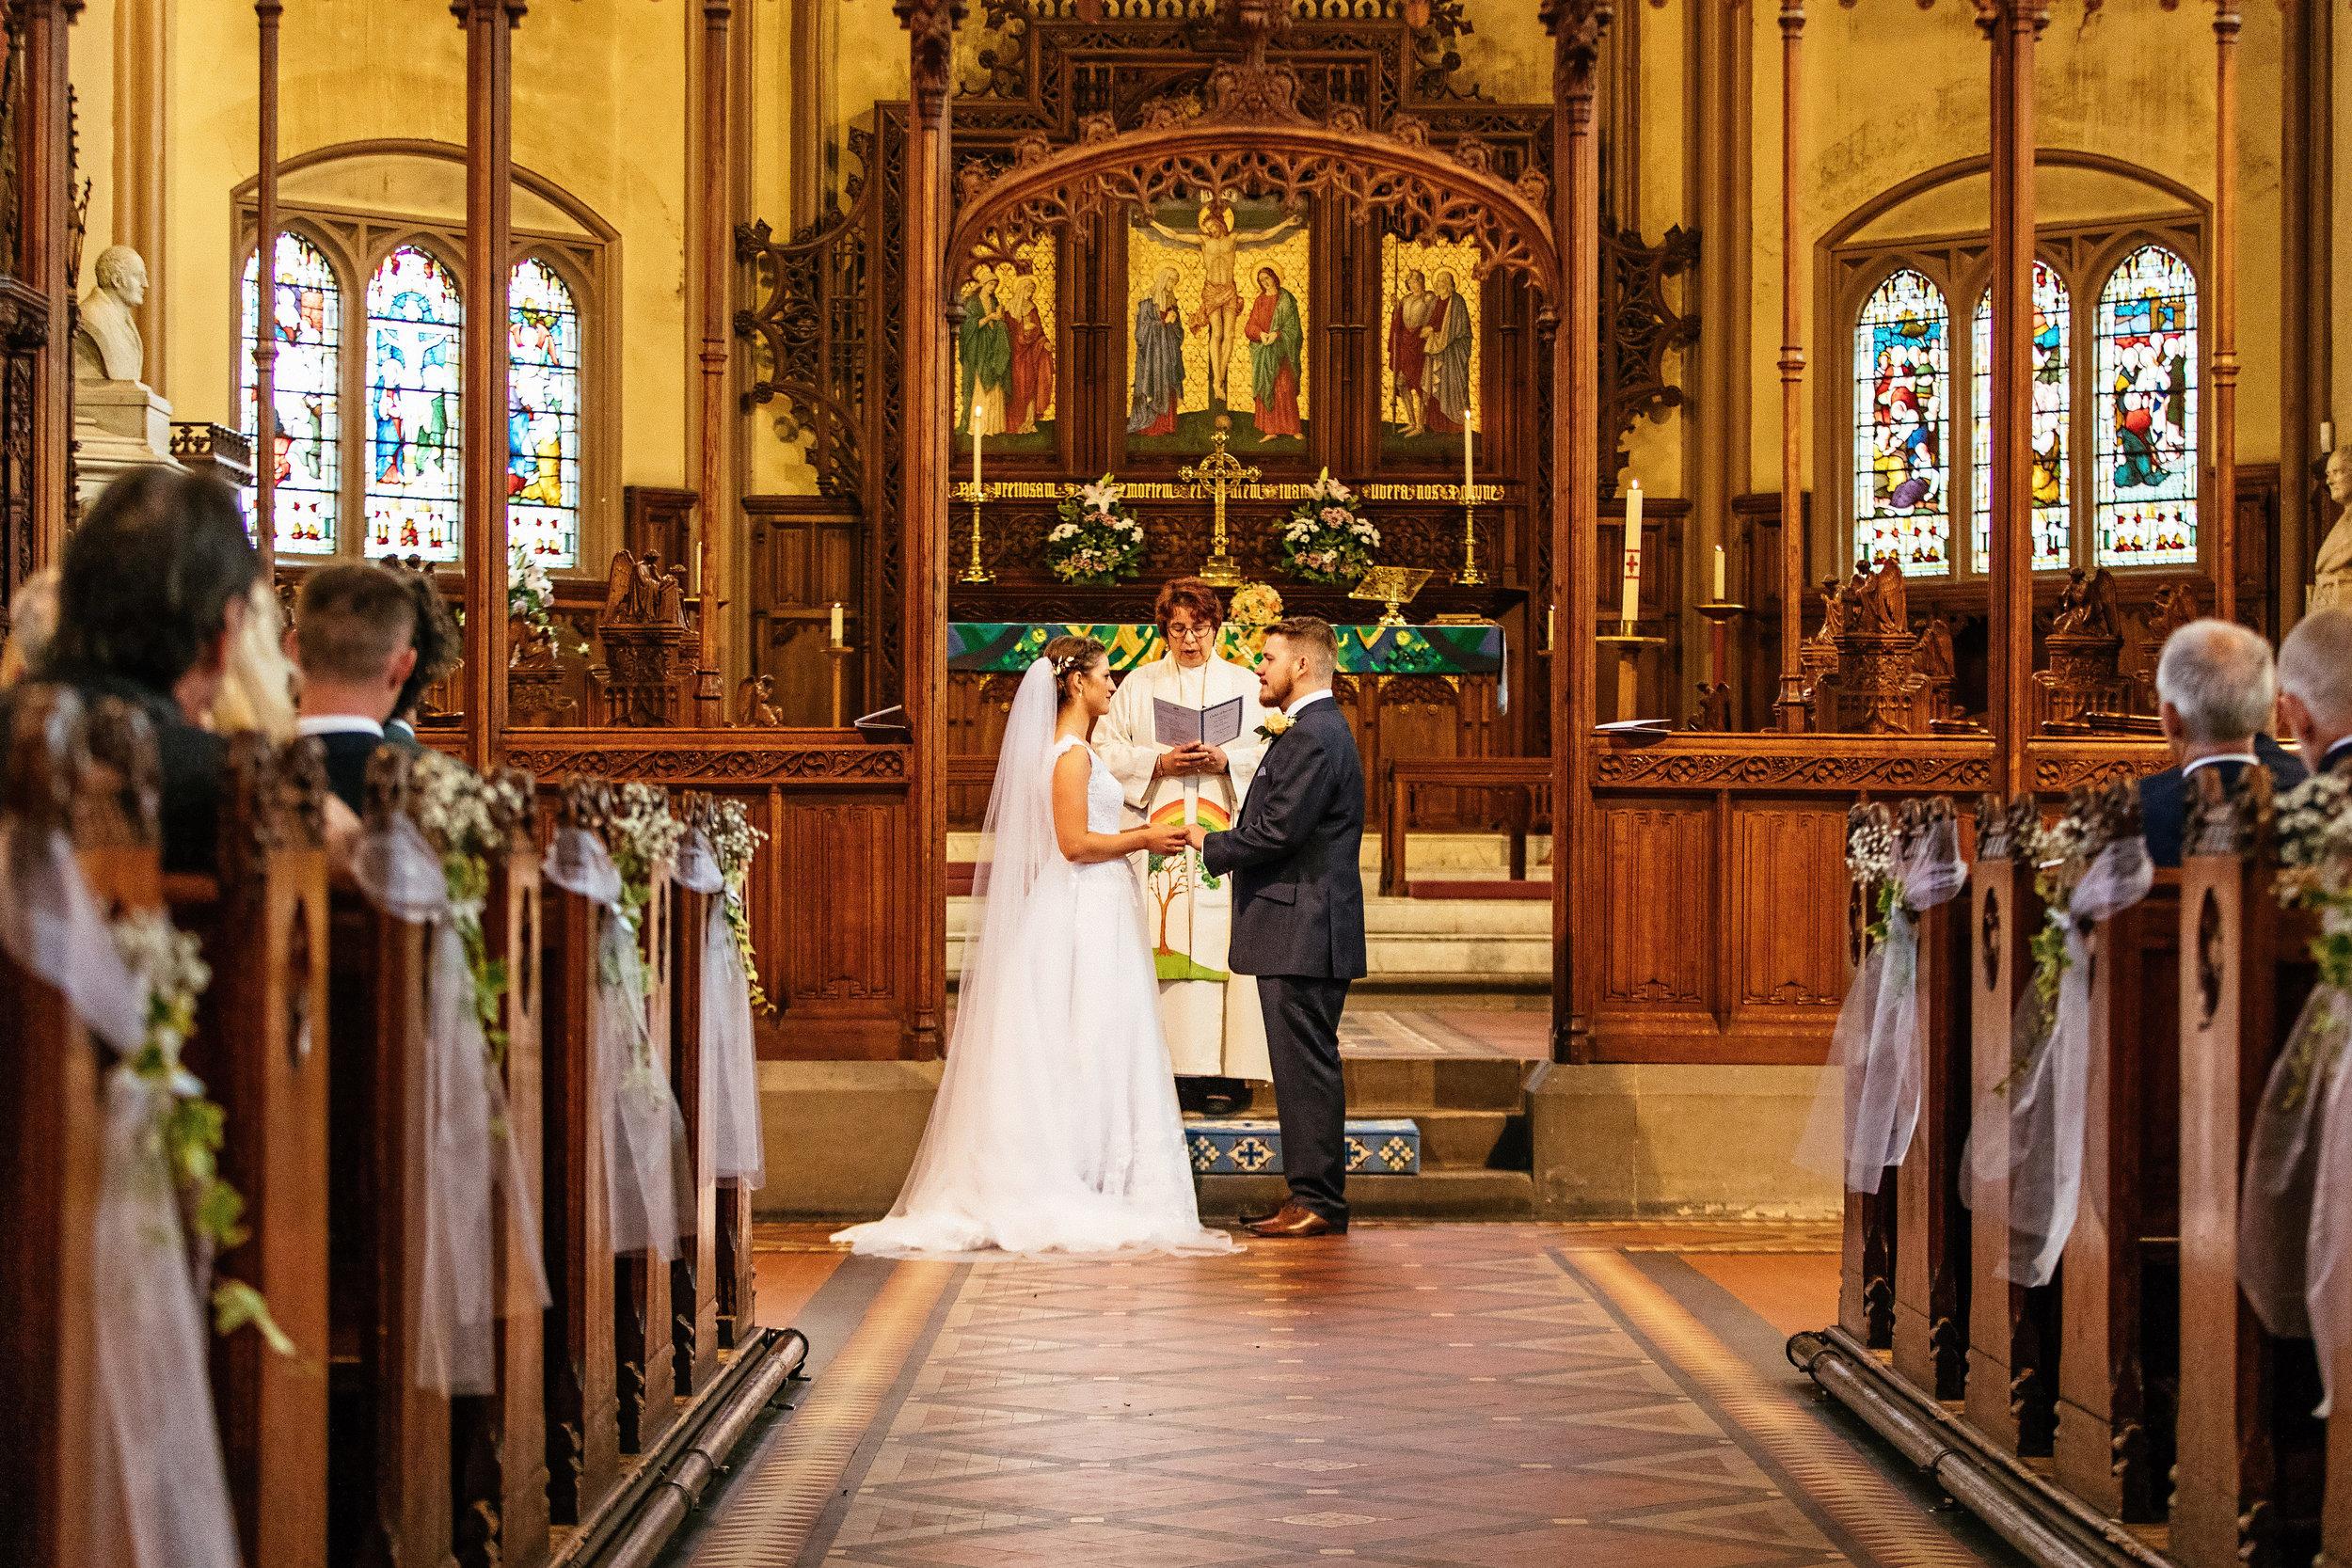 Kathryn-and-Mike-Wedding-Highlights-28.jpg